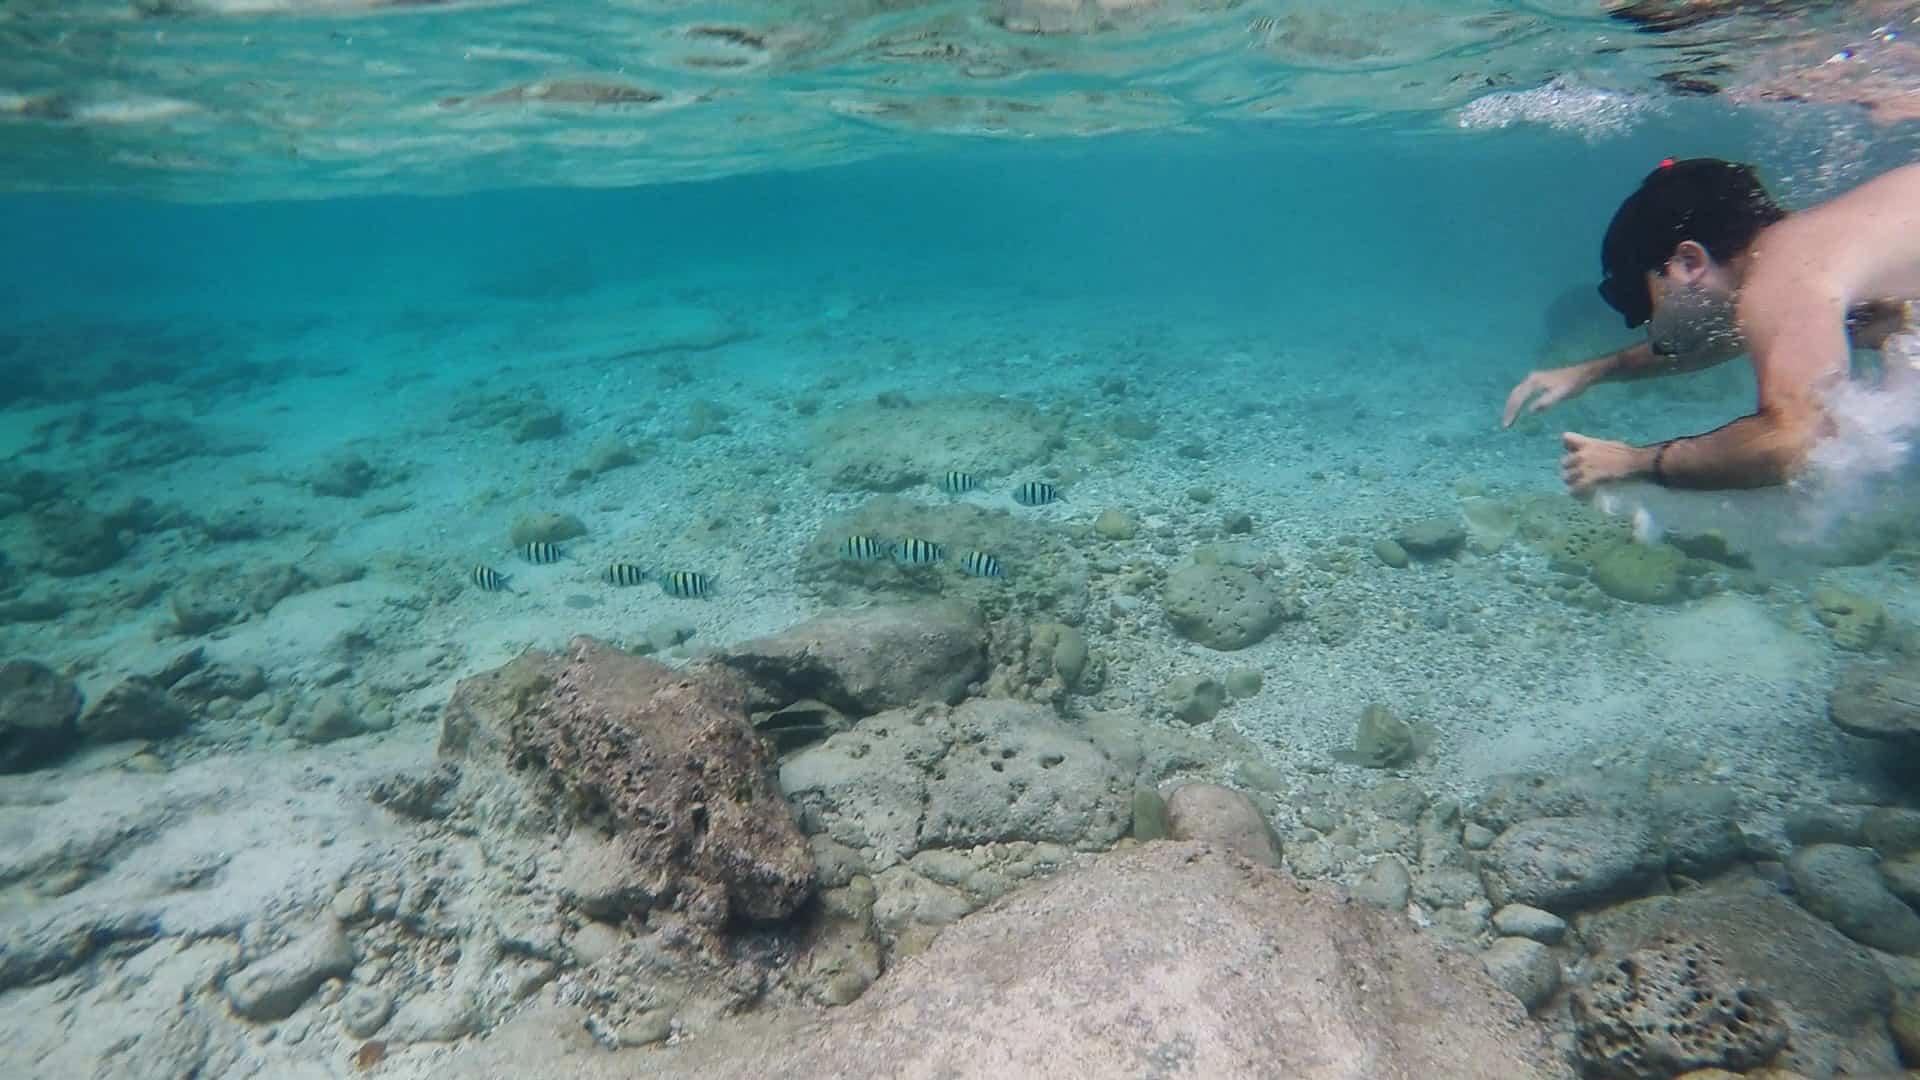 Snorkeling - à procura do Nemo